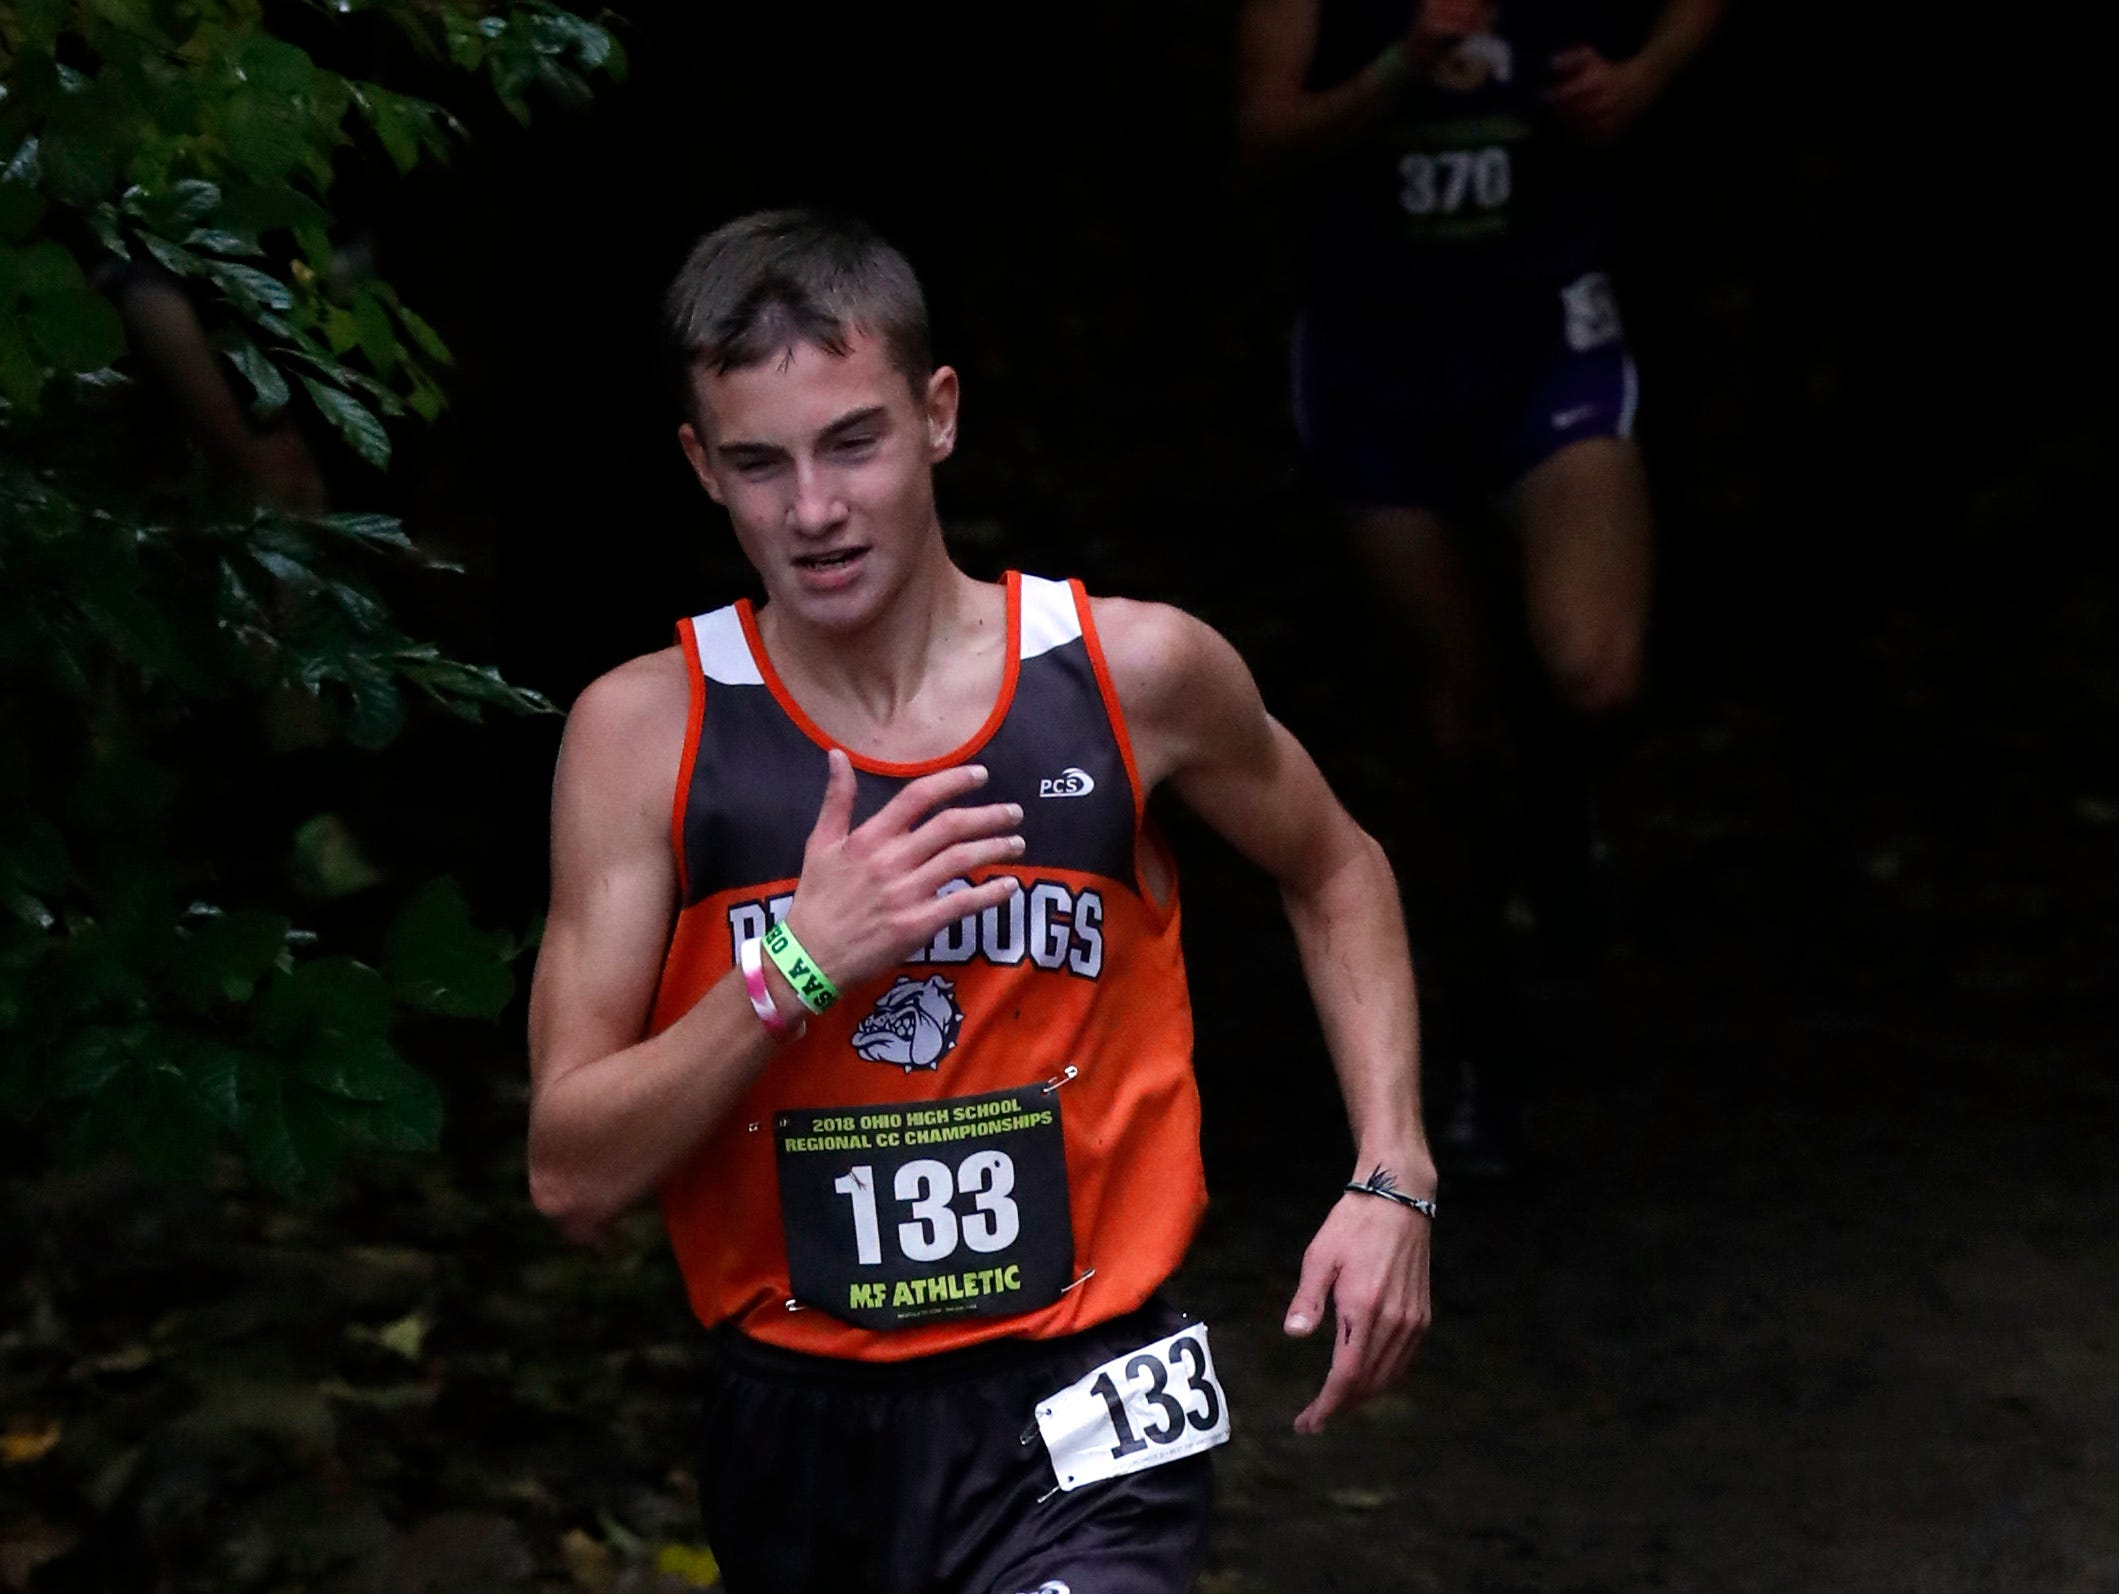 Heath's Dylan Hammond runs in the Regional Cross Country meet Saturday, Oct. 27, 2018, at Pickerington North High School in Pickerington.